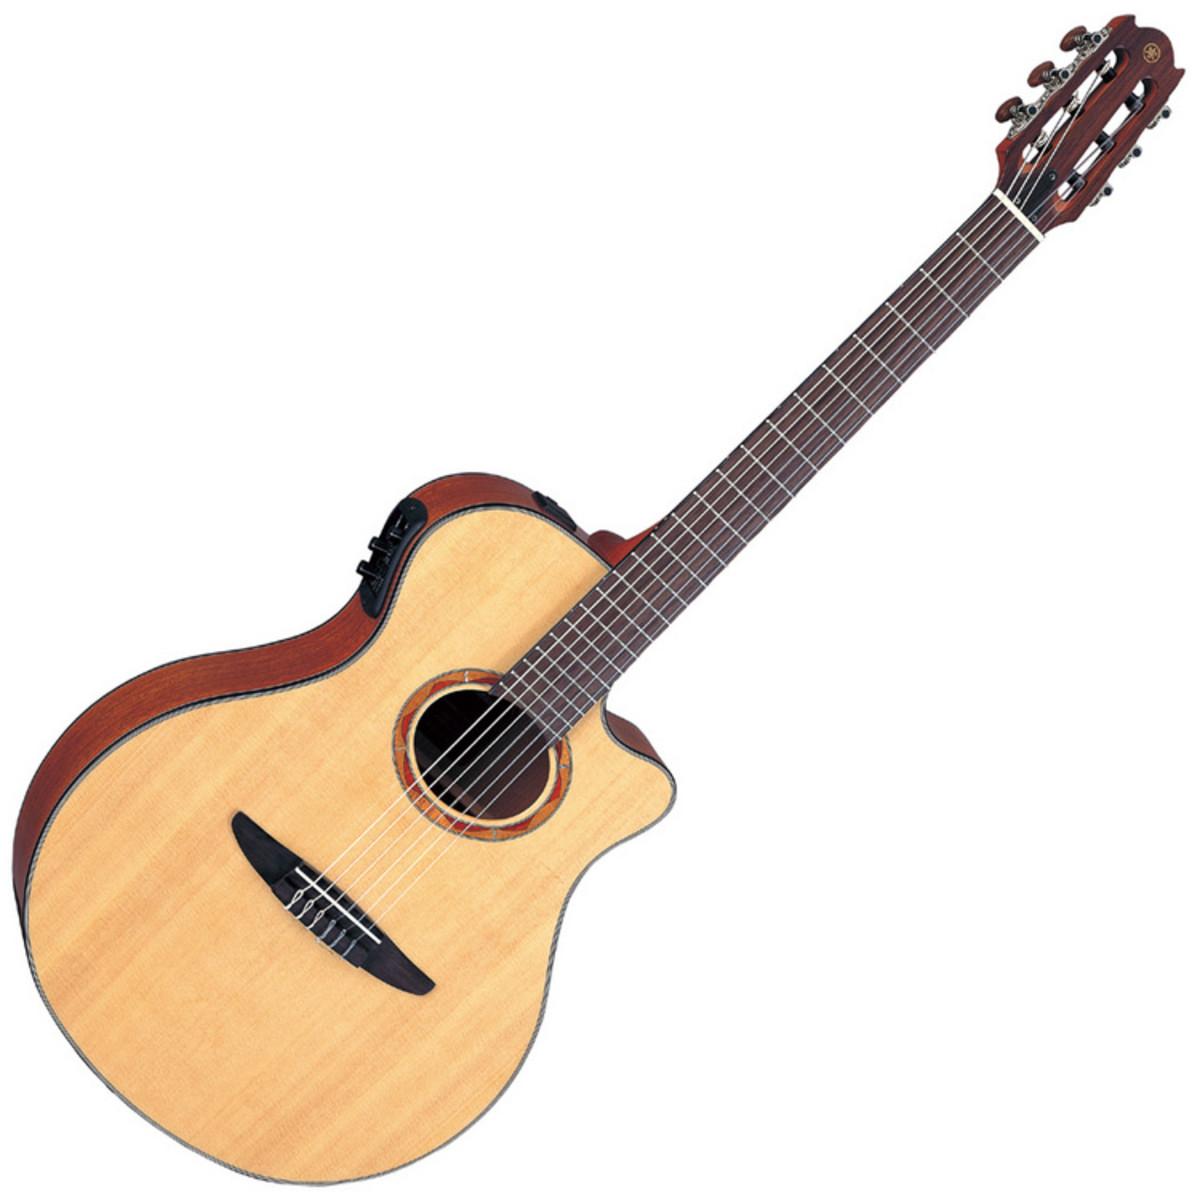 Yamaha Cacoustic Guitar Price